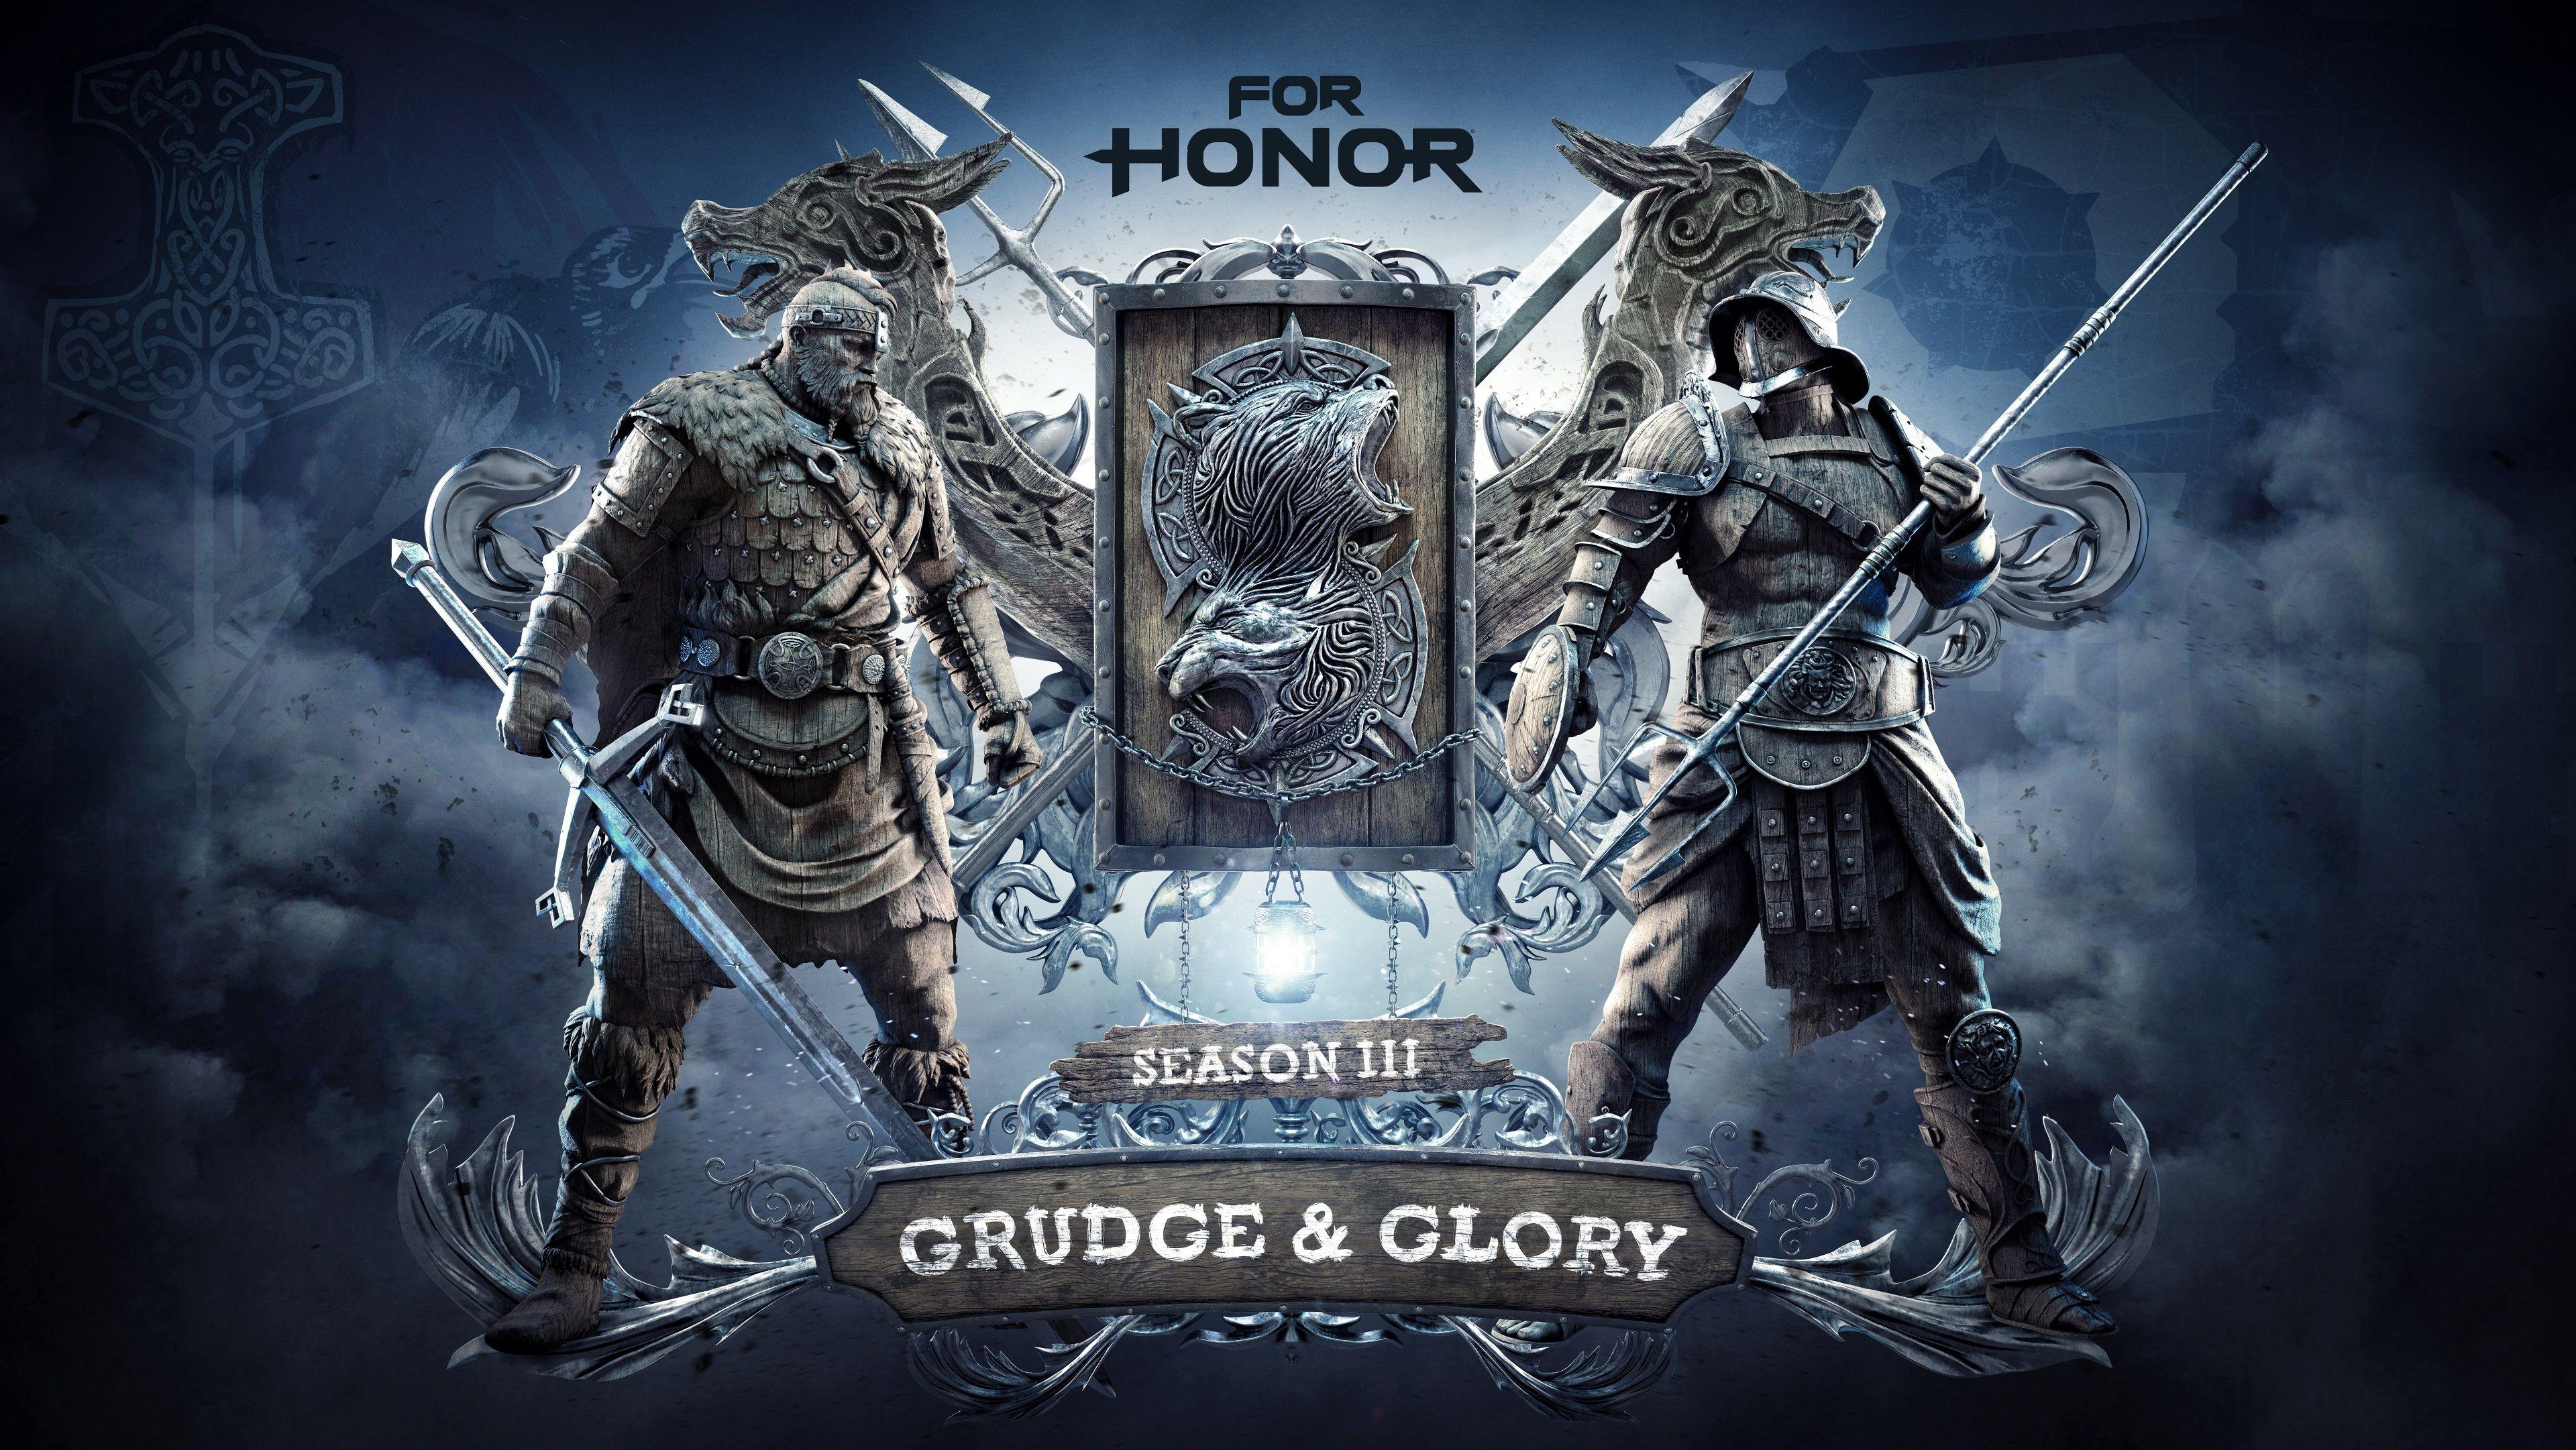 3840x2162 For Honor 4k Interesting Wallpaper Hd Poster Seasons Honor